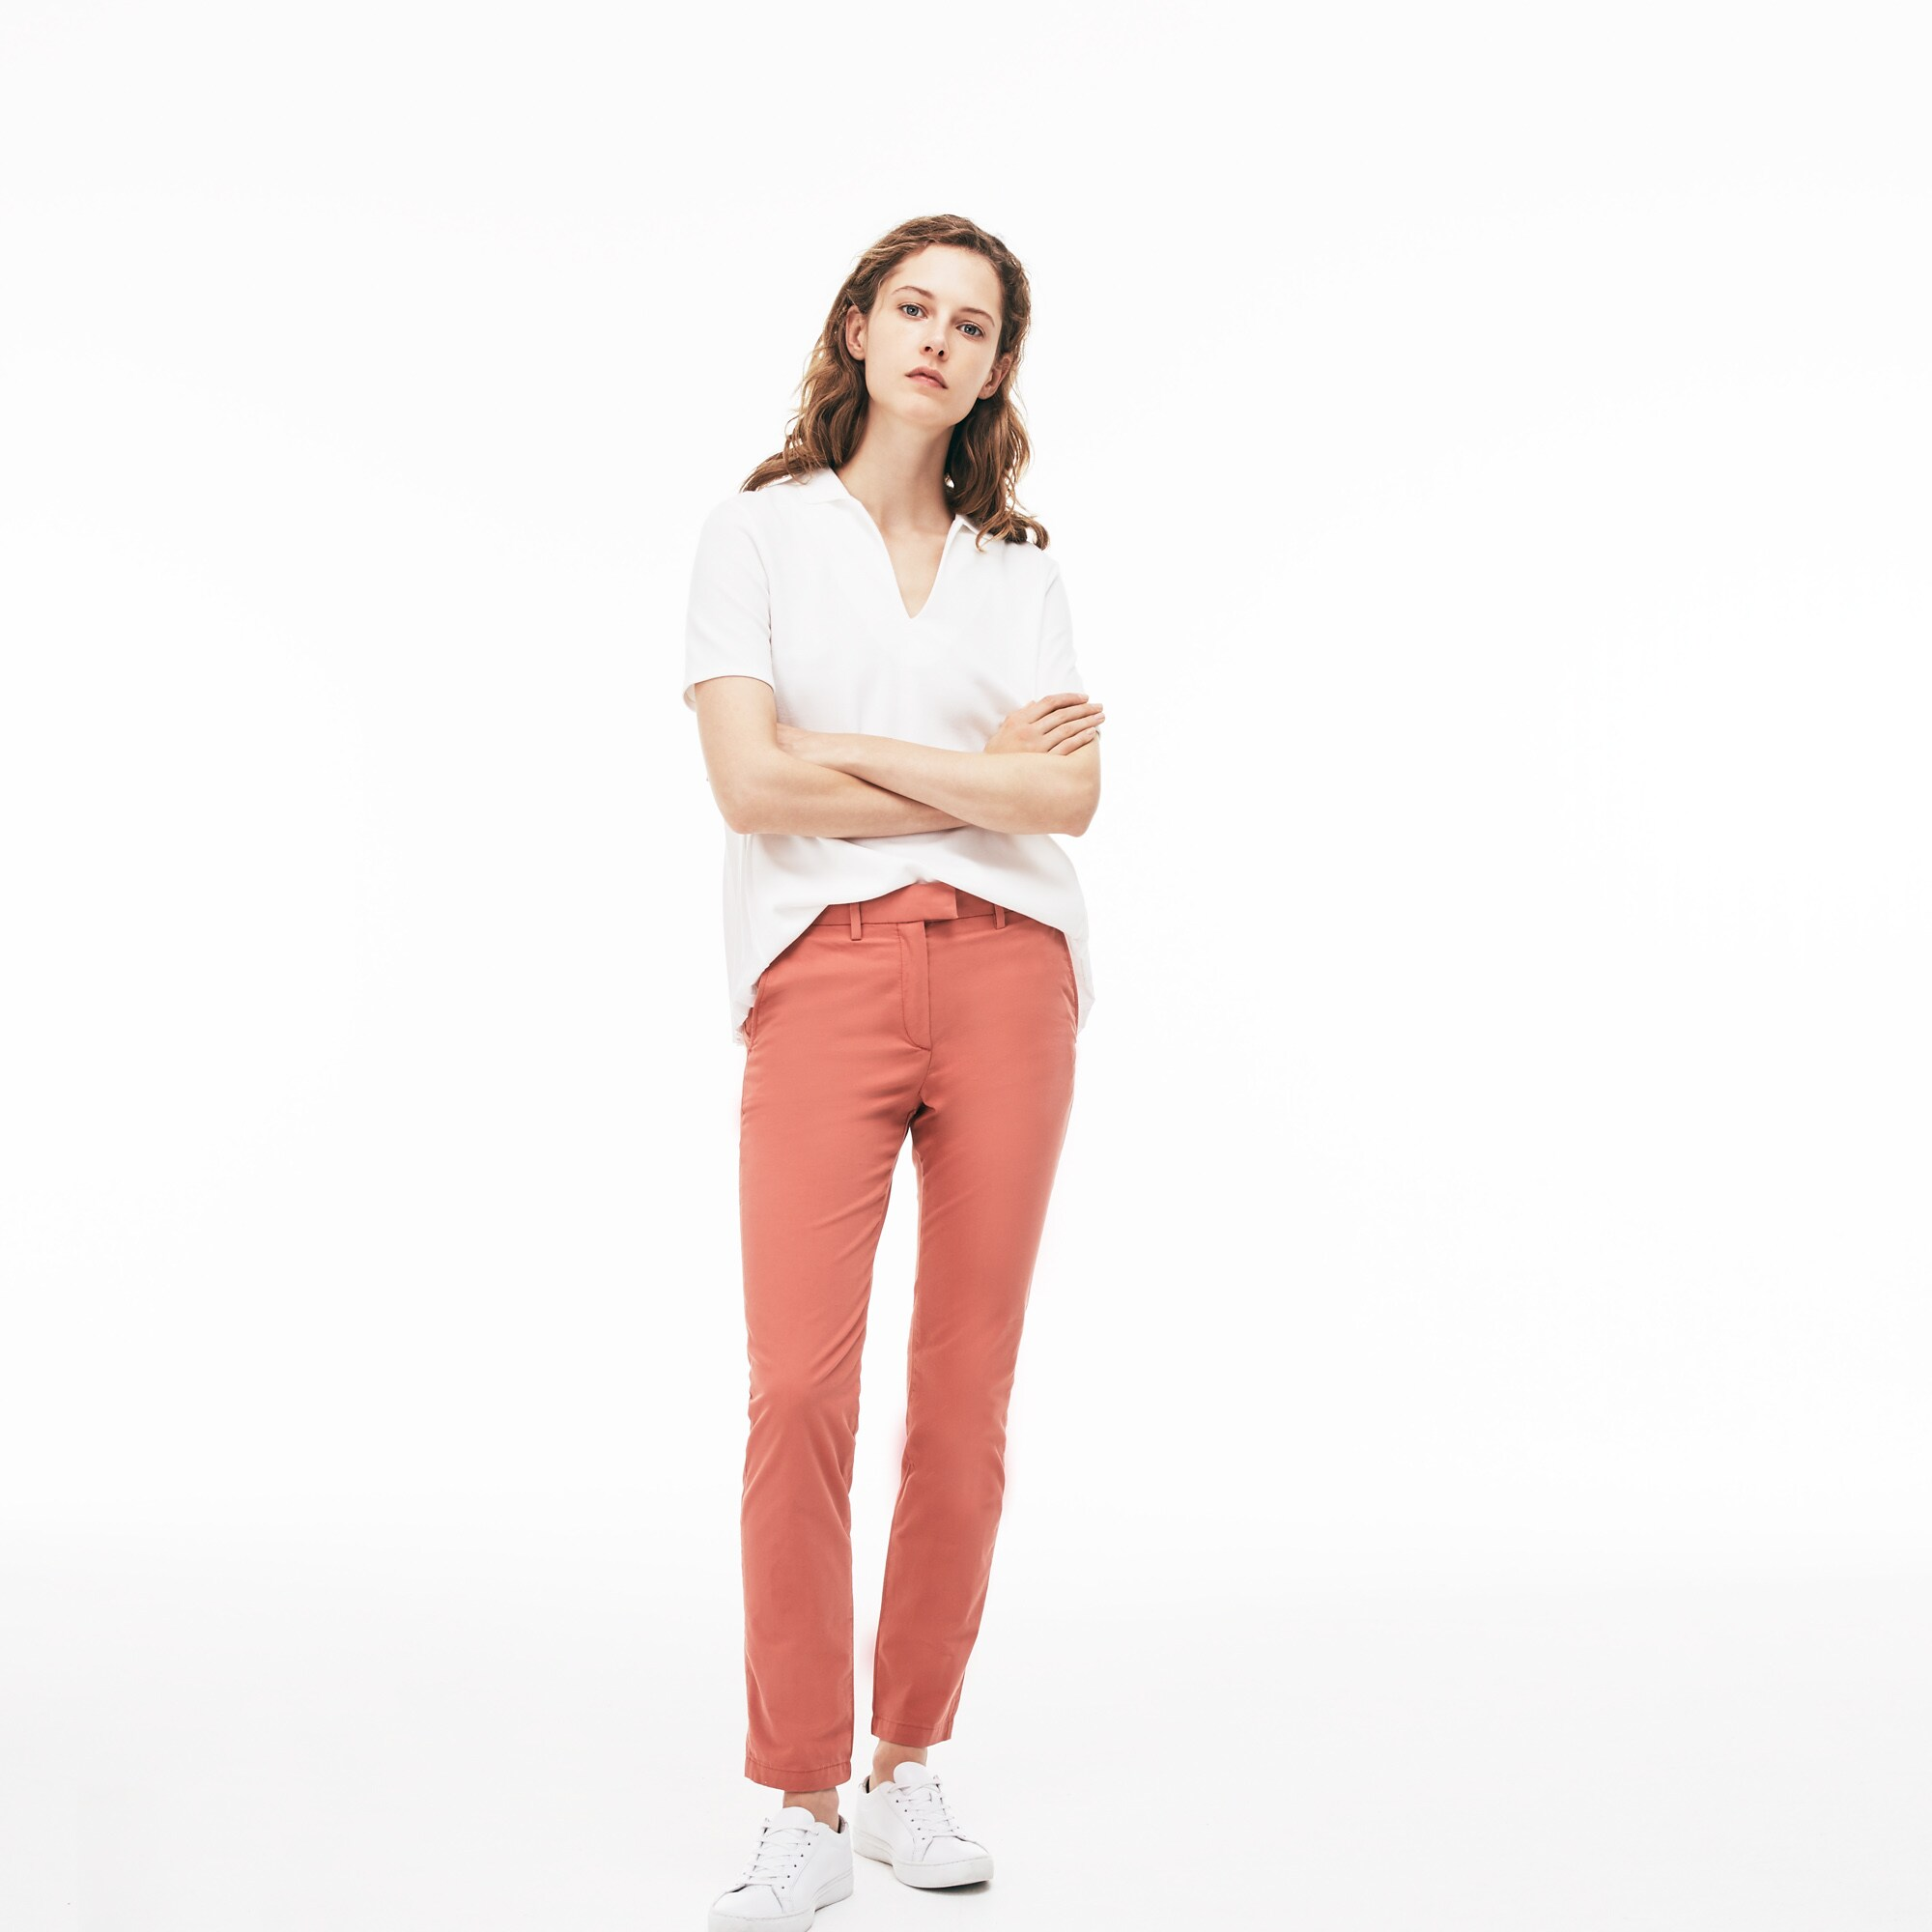 Pantaloni chino regular fit con pince in gabardine stretch tinta unita